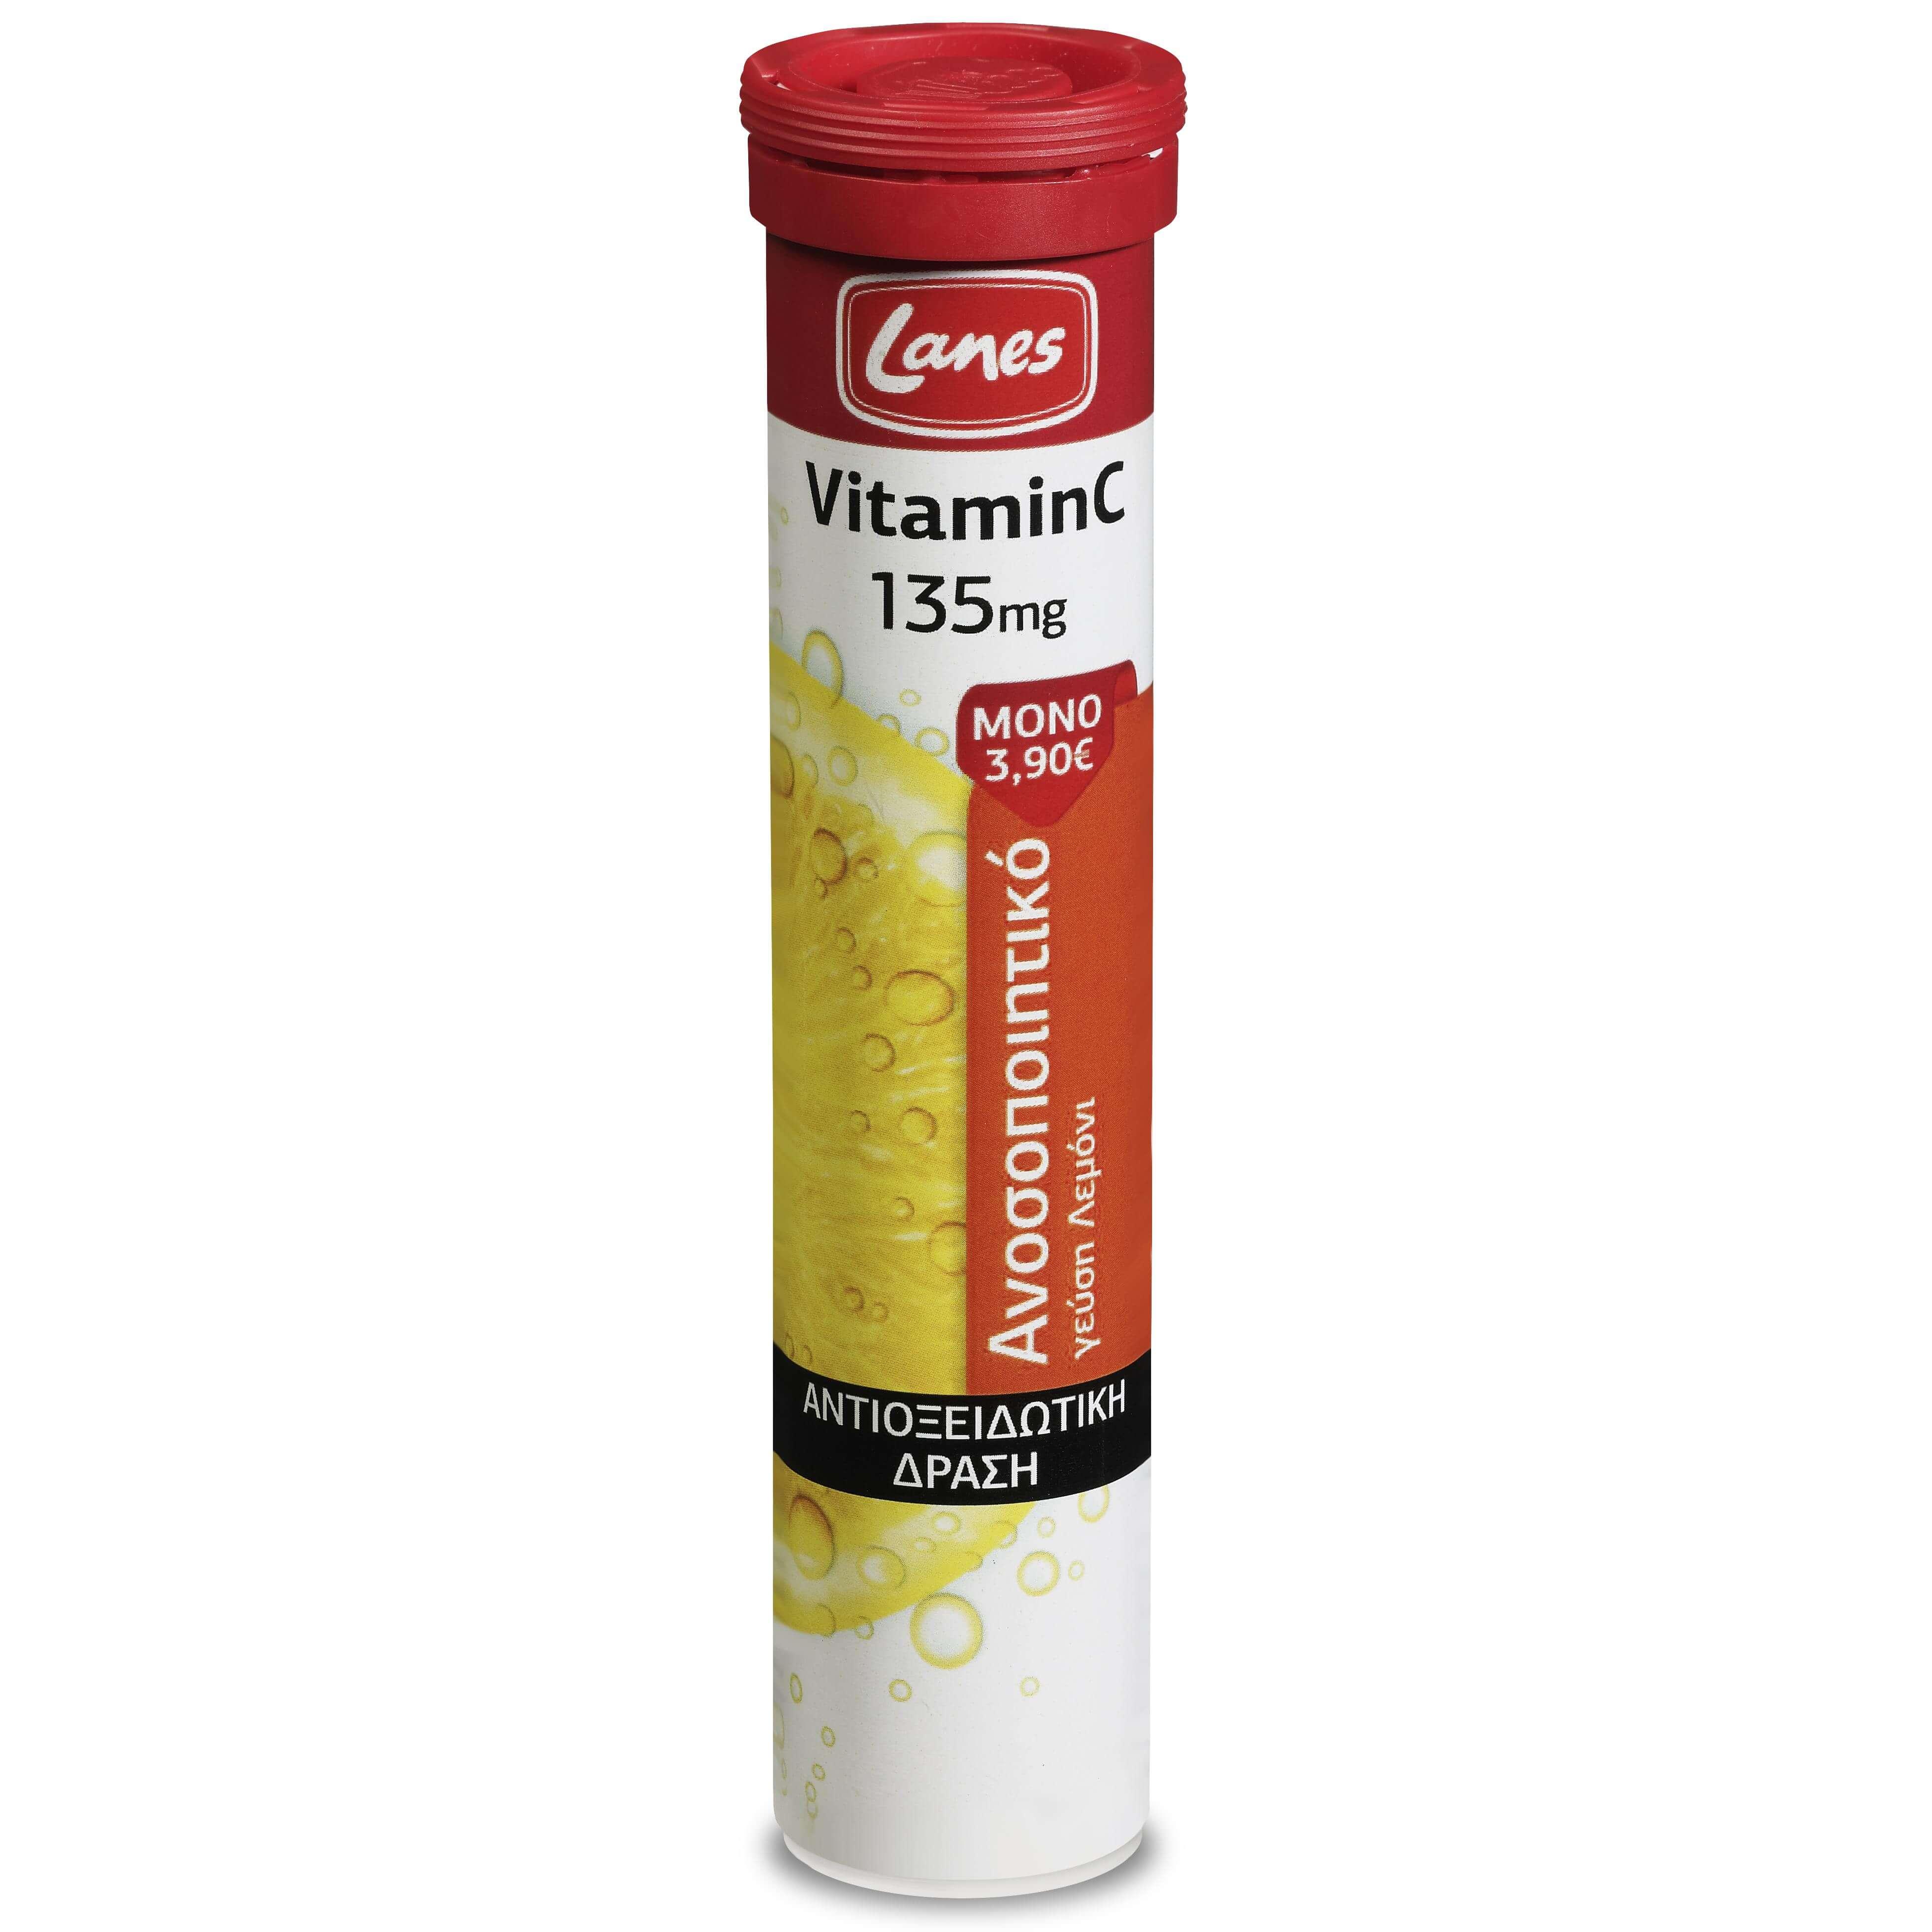 Lanes Vitamin C 135mg Αναβράζουσα Βιταμίνη C για την Ενίσχυση του Ανοσοποιητικού με Γεύση Λεμόνι 20 Effer. Tabs